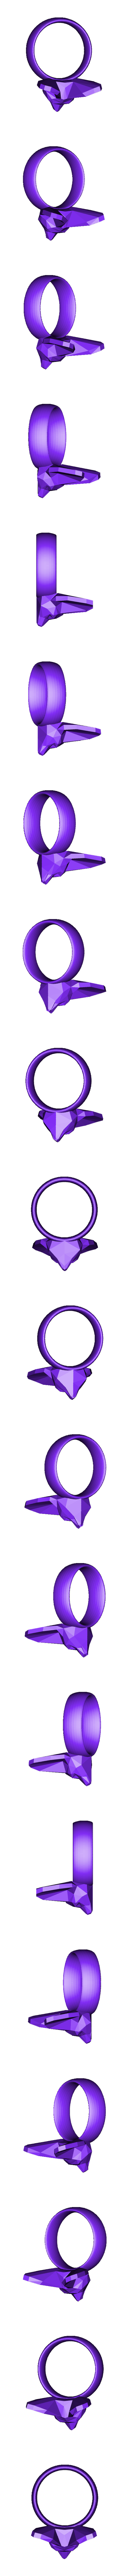 fennec_fox_ring_v2.stl Download free STL file Fennec Fox Ring • 3D printer object, AlbertKhan3D